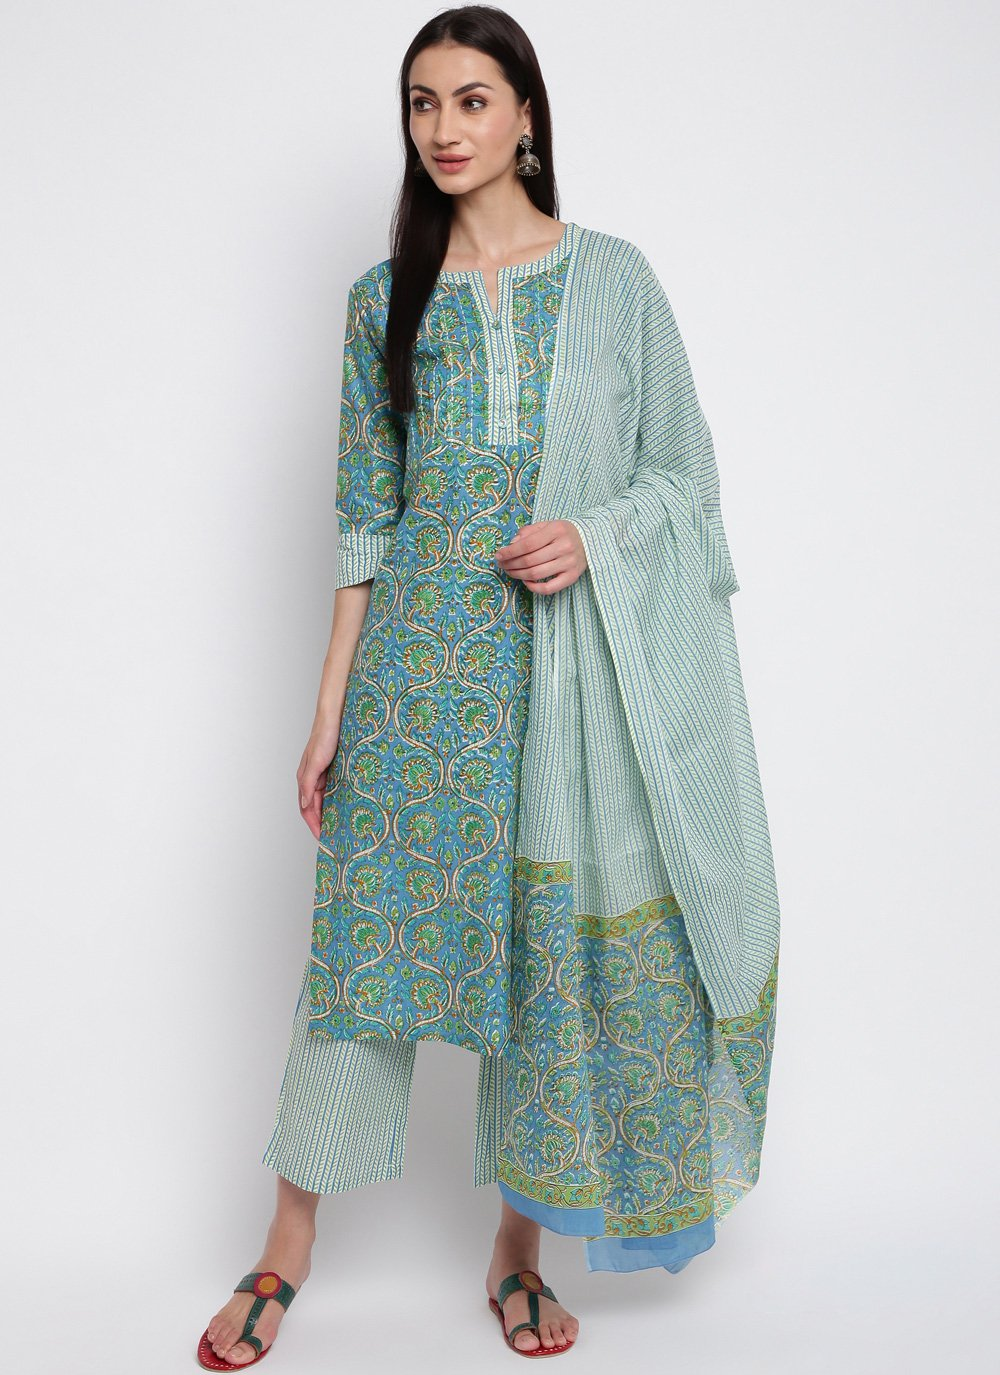 Printed Cotton Multi Colour Trendy Salwar Kameez